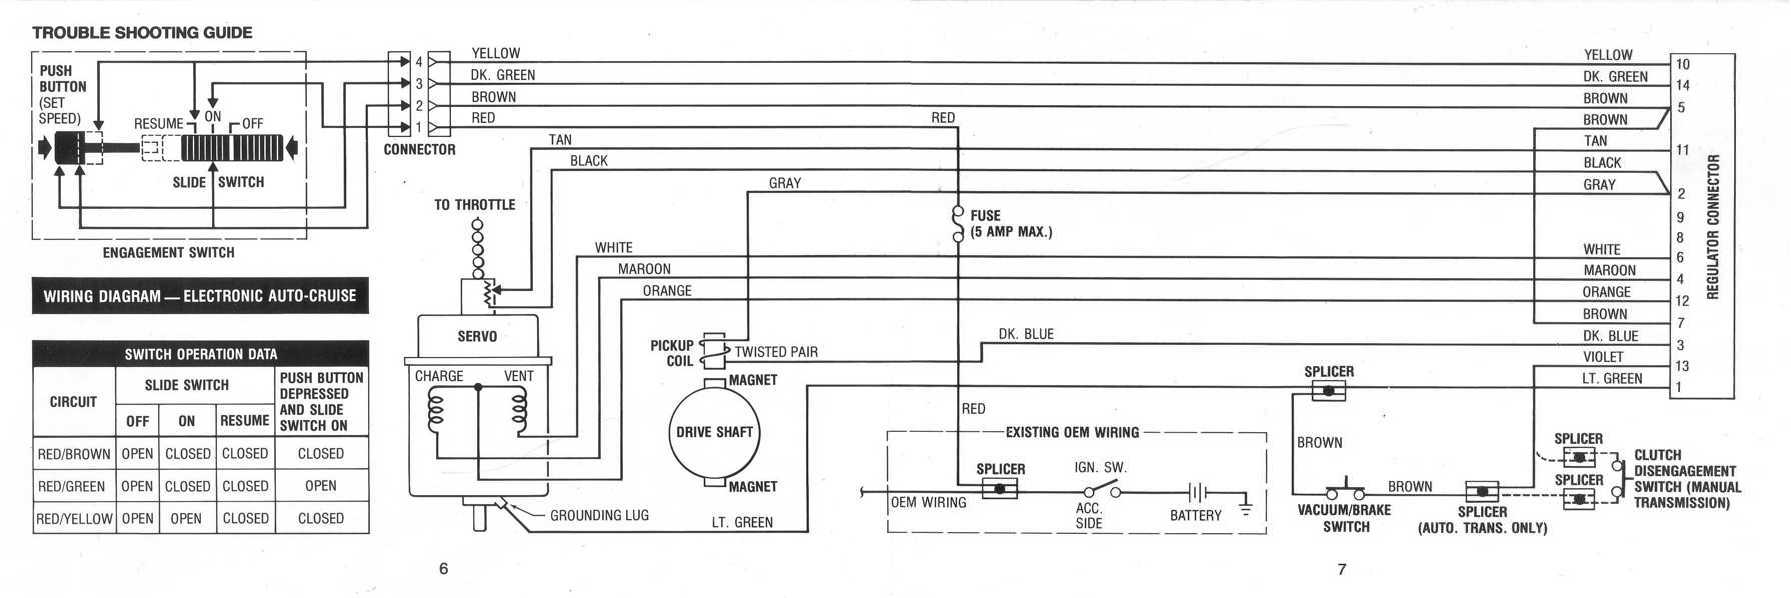 Iskra Alternator Wiring Diagram Wiring Diagram And Hernes - 12v alternator wiring diagram